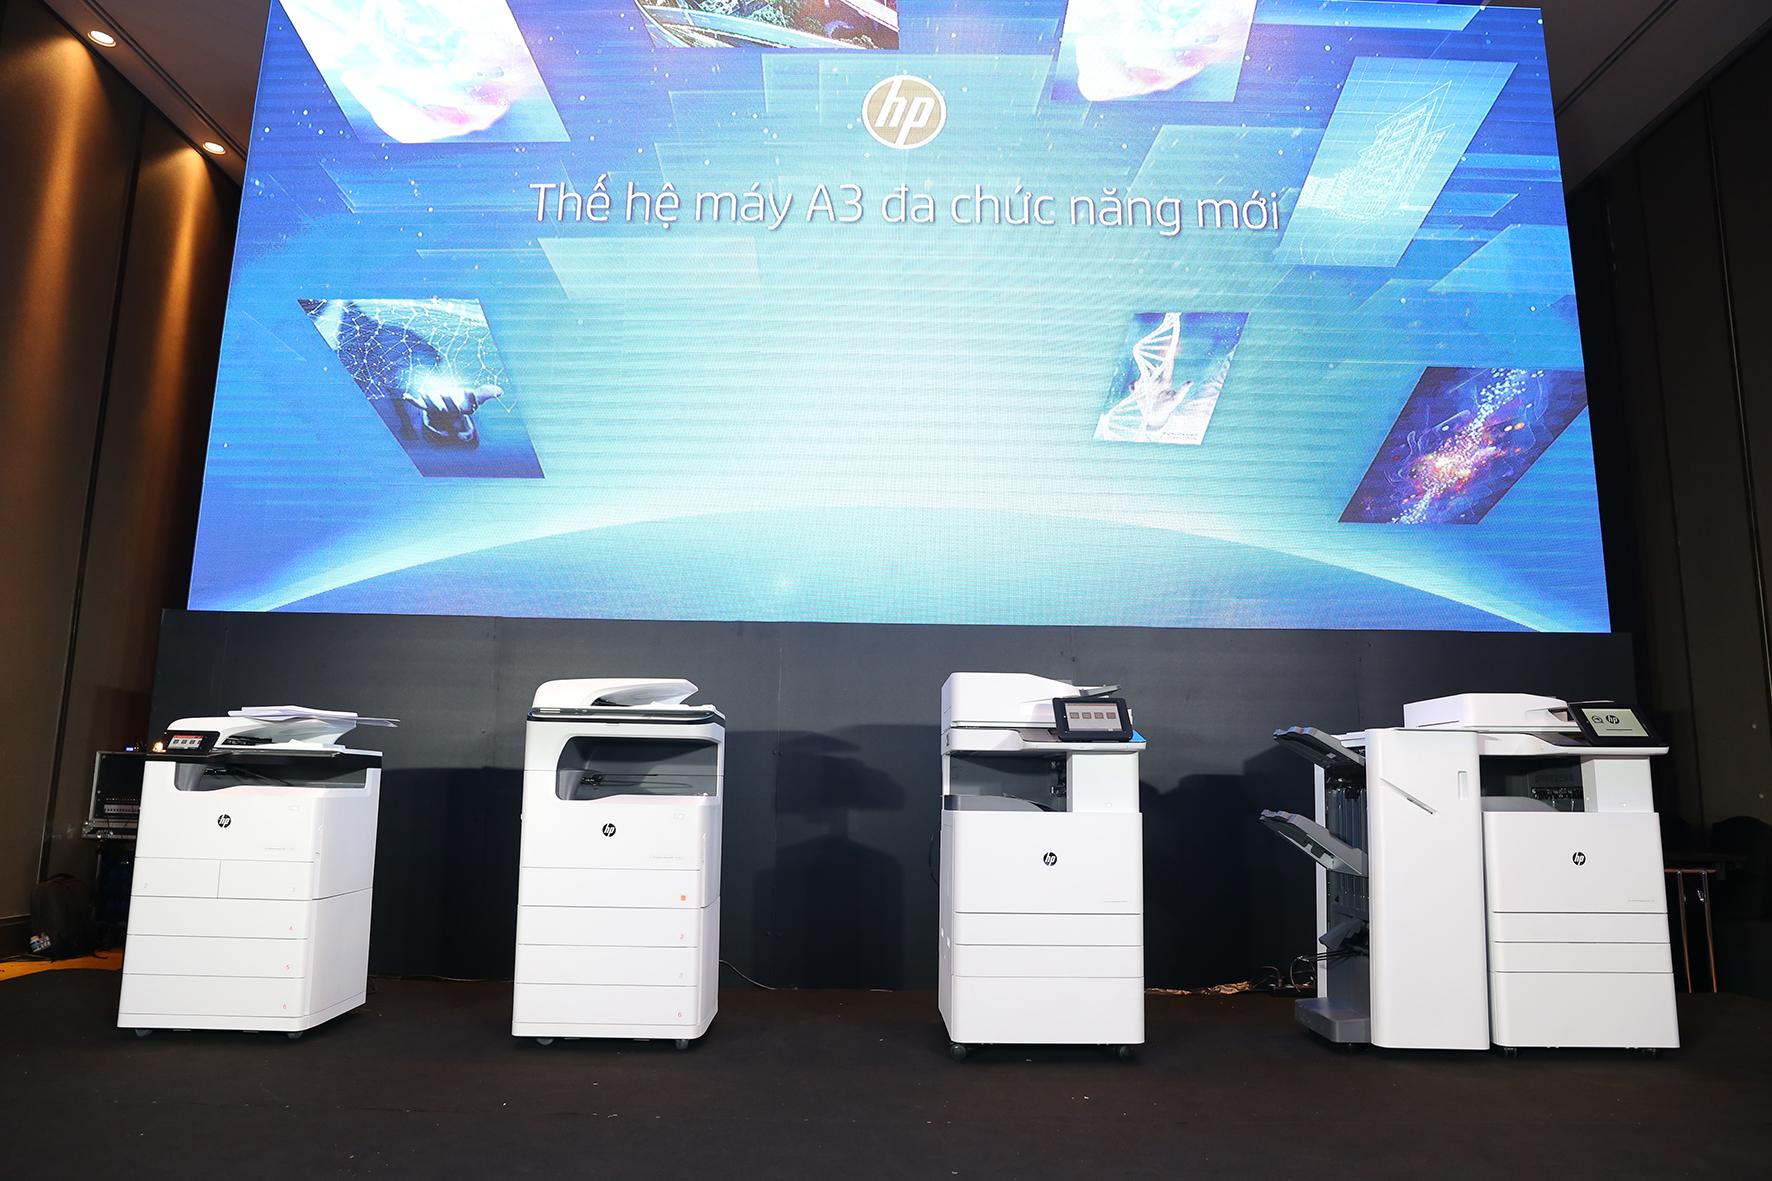 hp advances office of the future with next generation laserjet portfolio